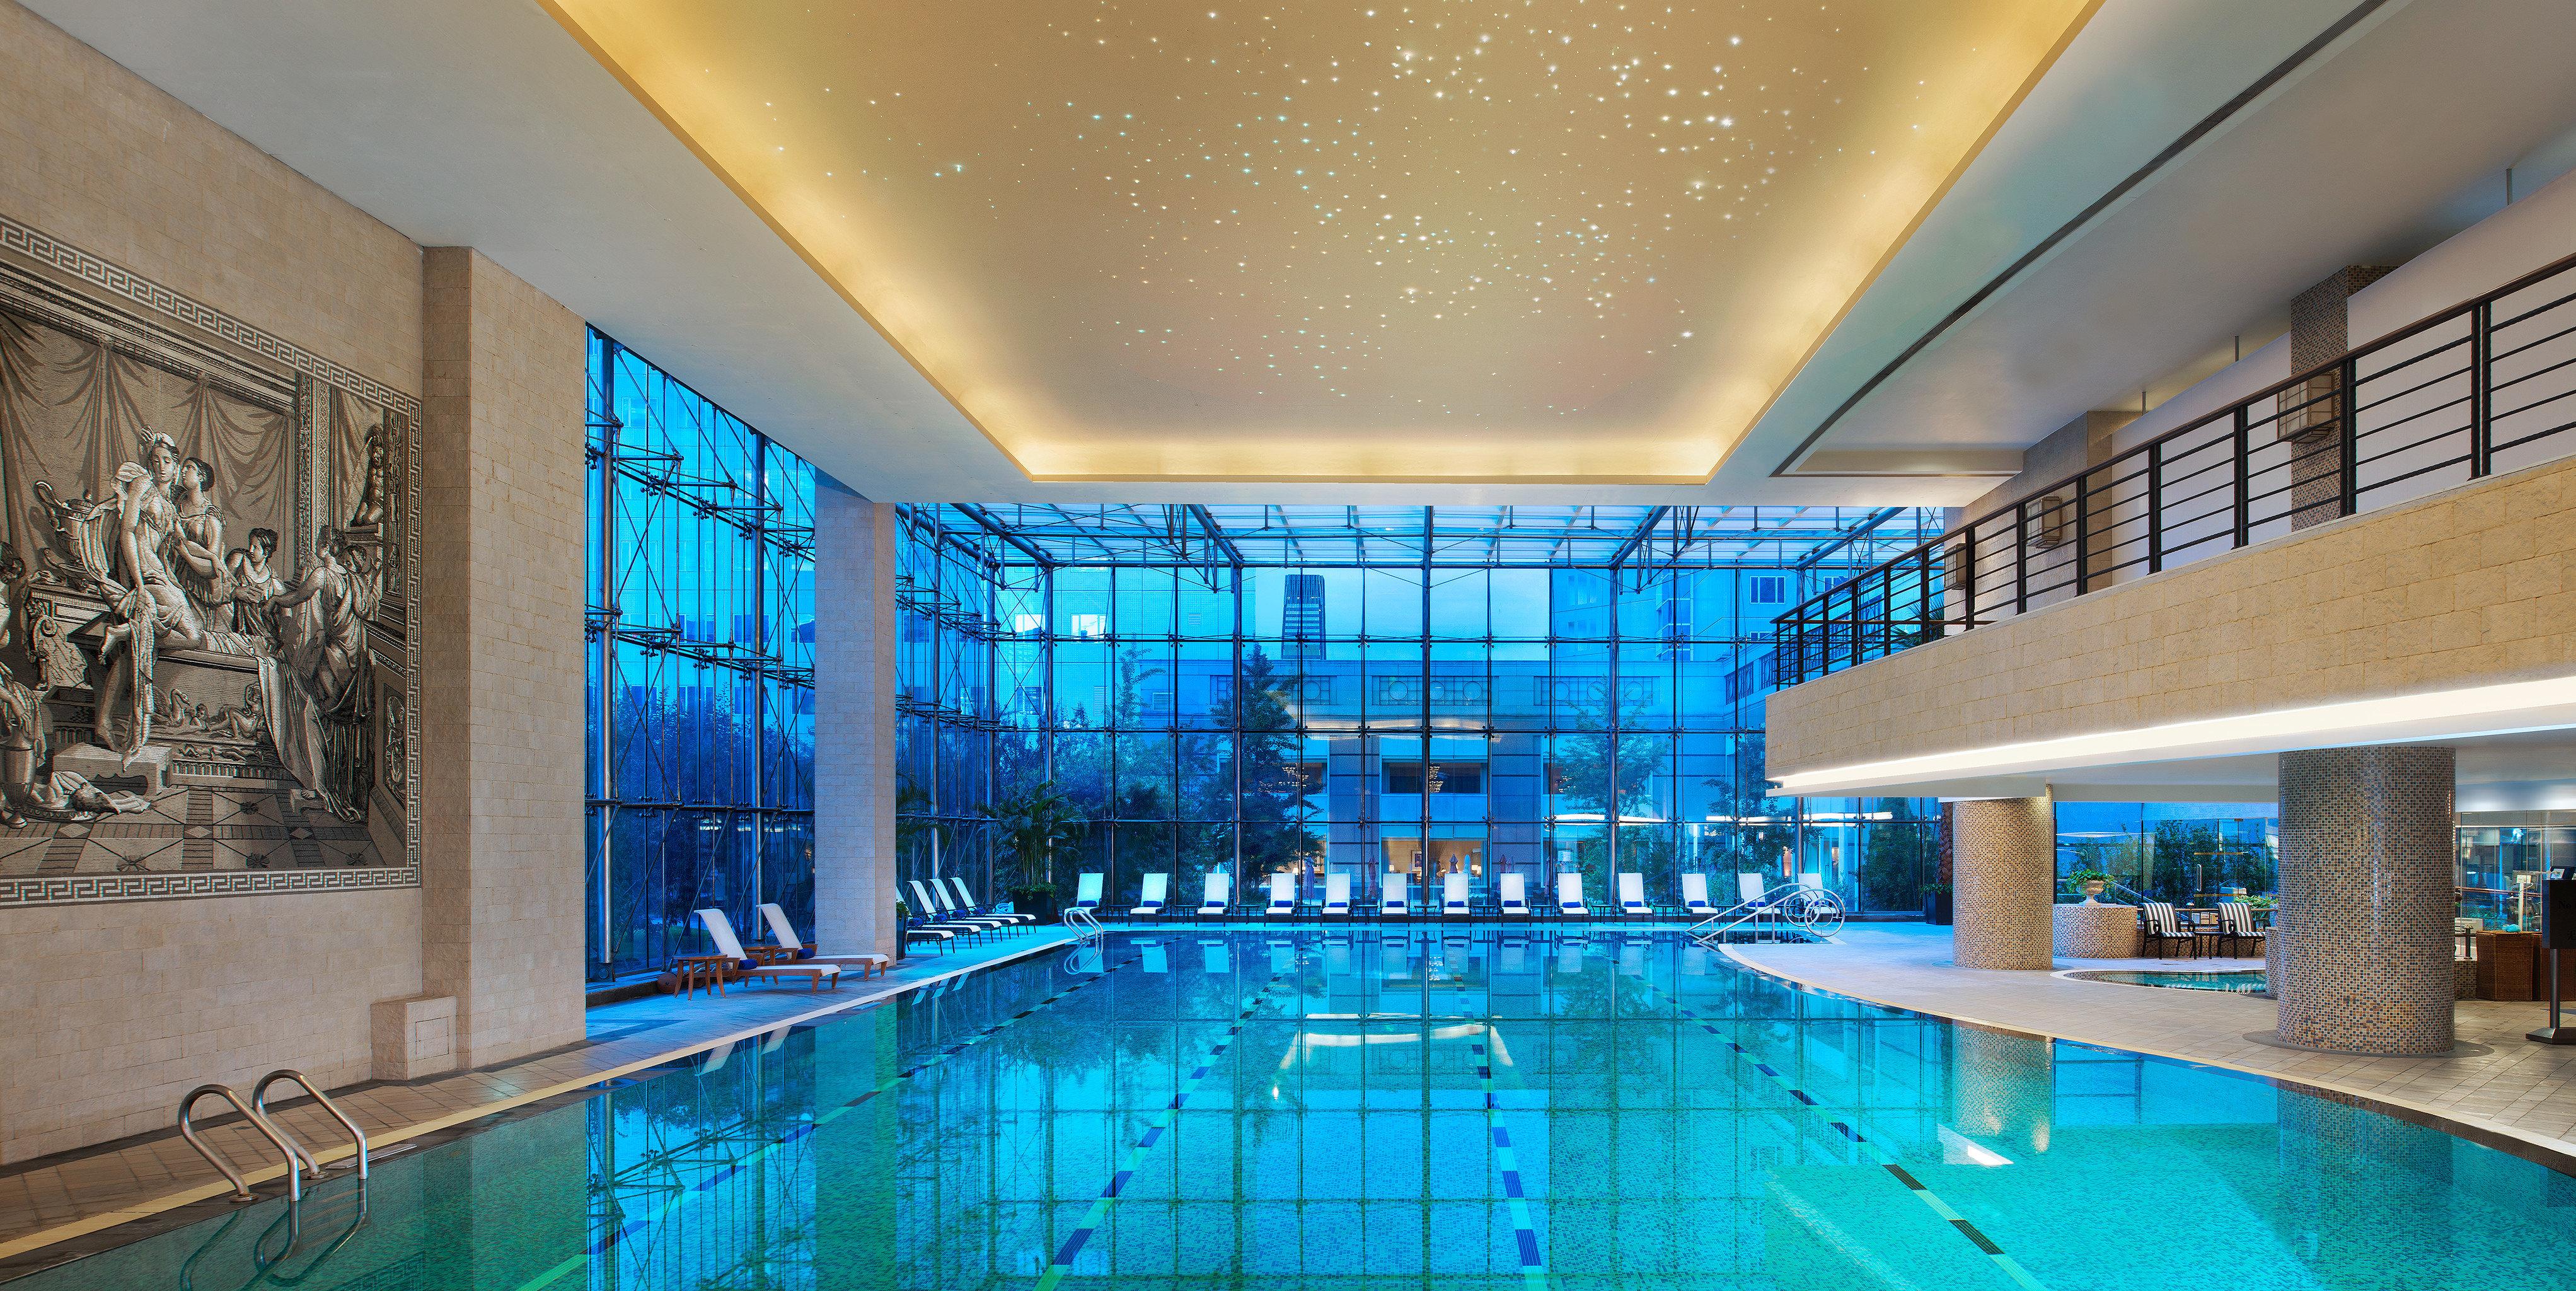 swimming pool property leisure centre Lobby daylighting condominium tub mansion blue bathtub tile Bath Resort